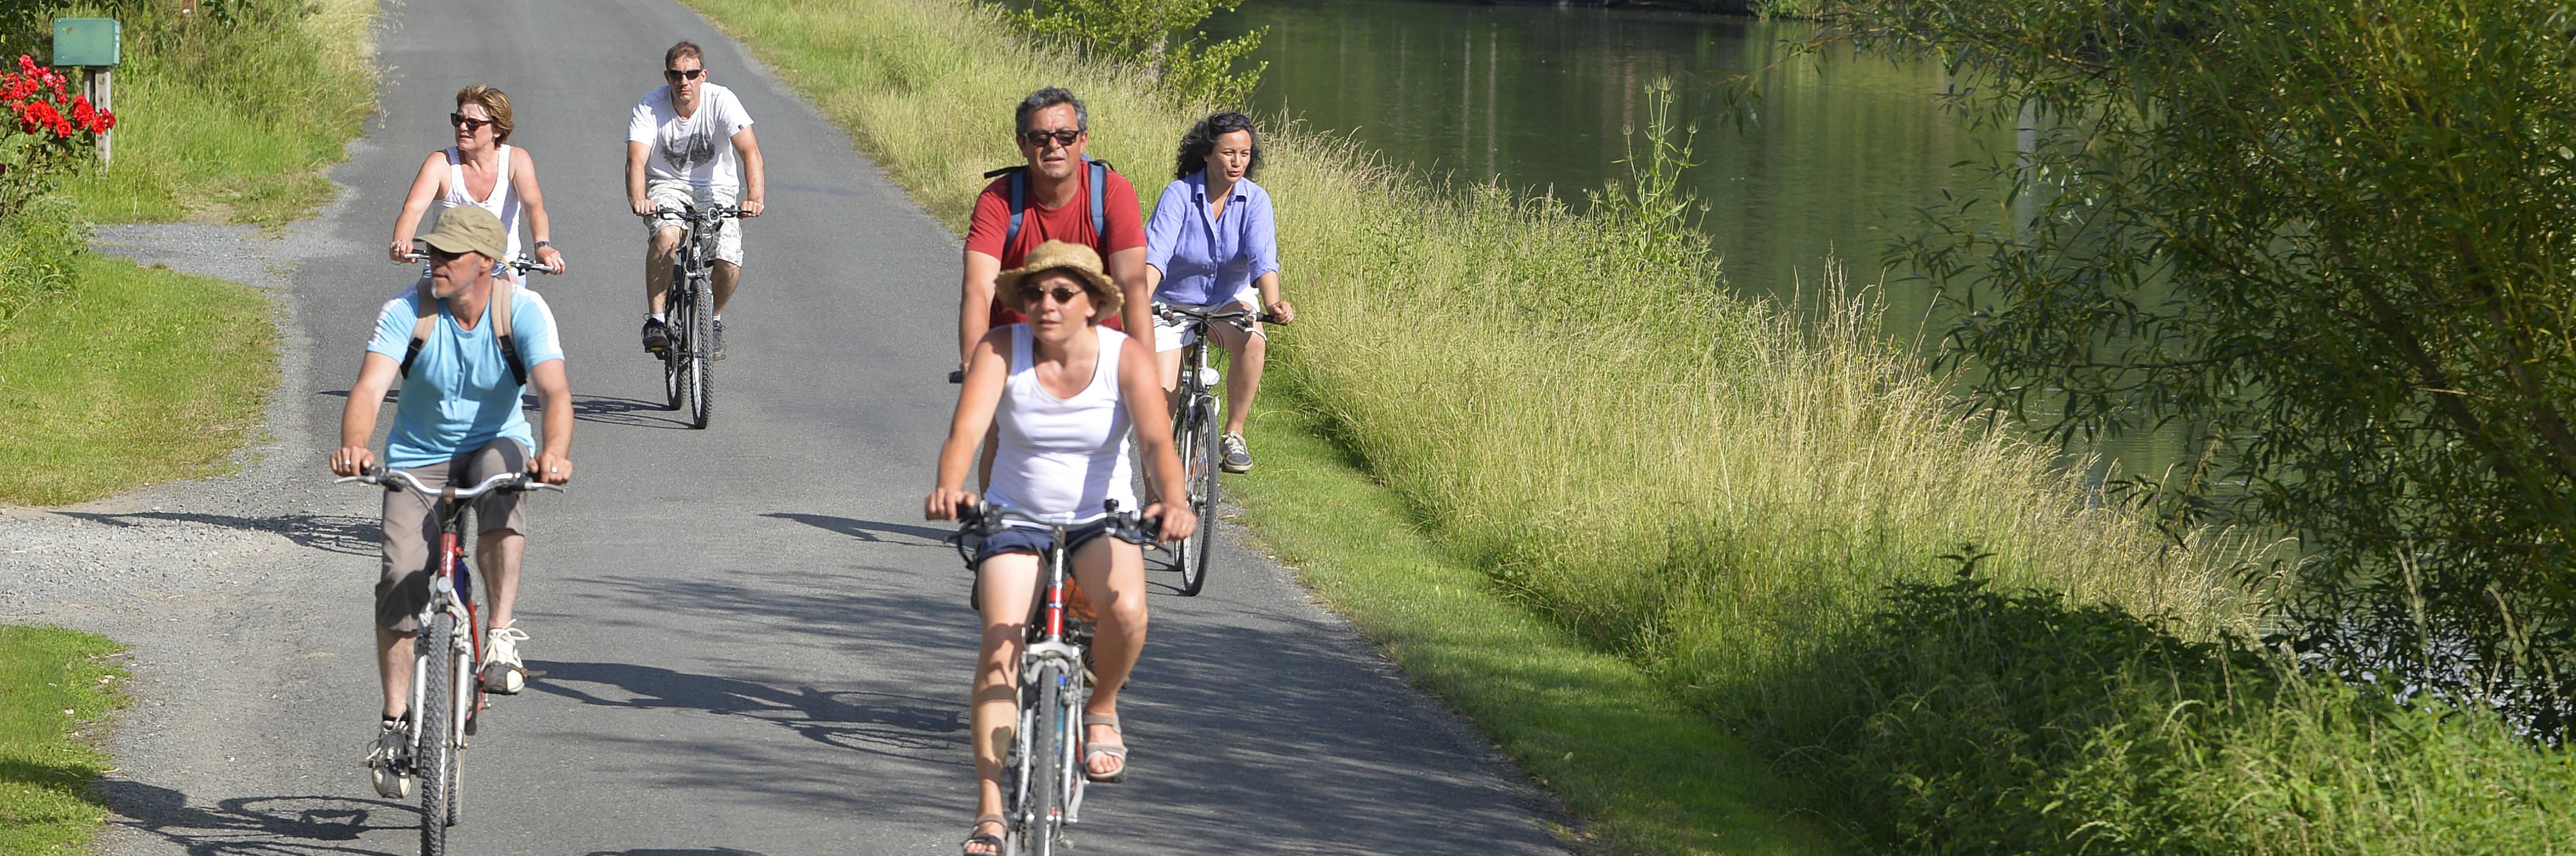 Circuit 9, a bike ride in the heart of the Marais poitevin